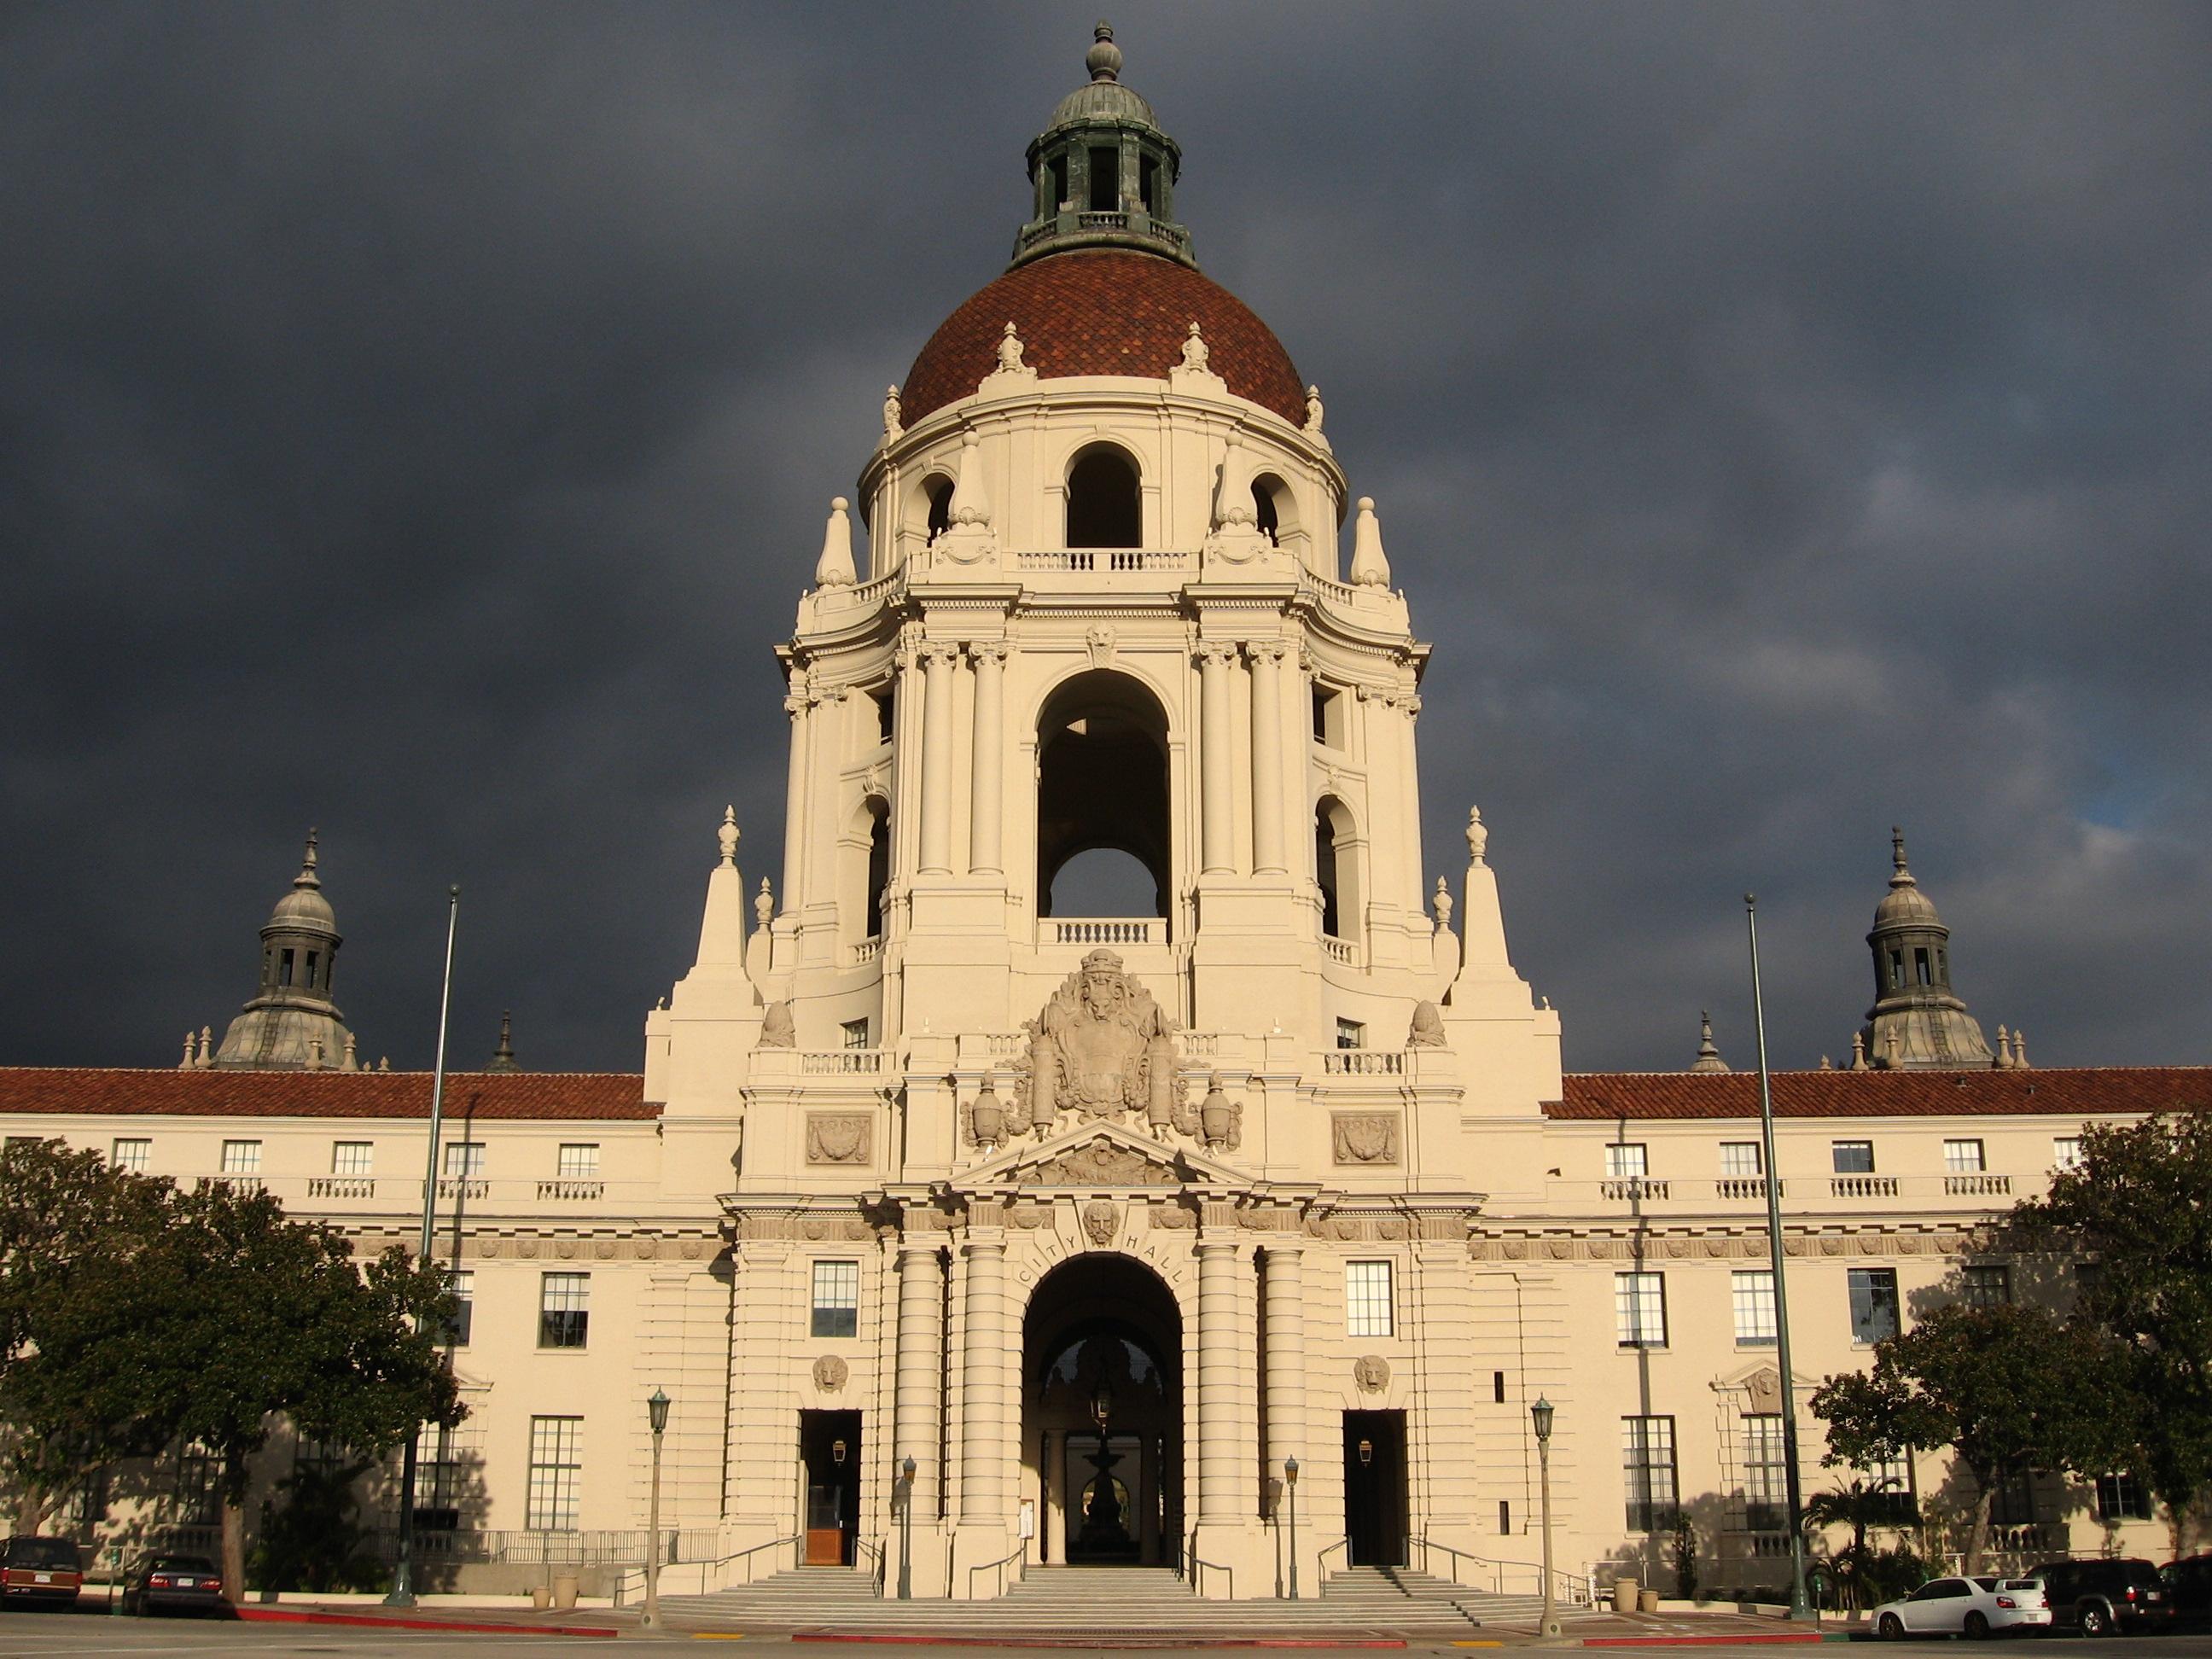 File Pasadena City Hall 2 jpg - Wikimedia Commons